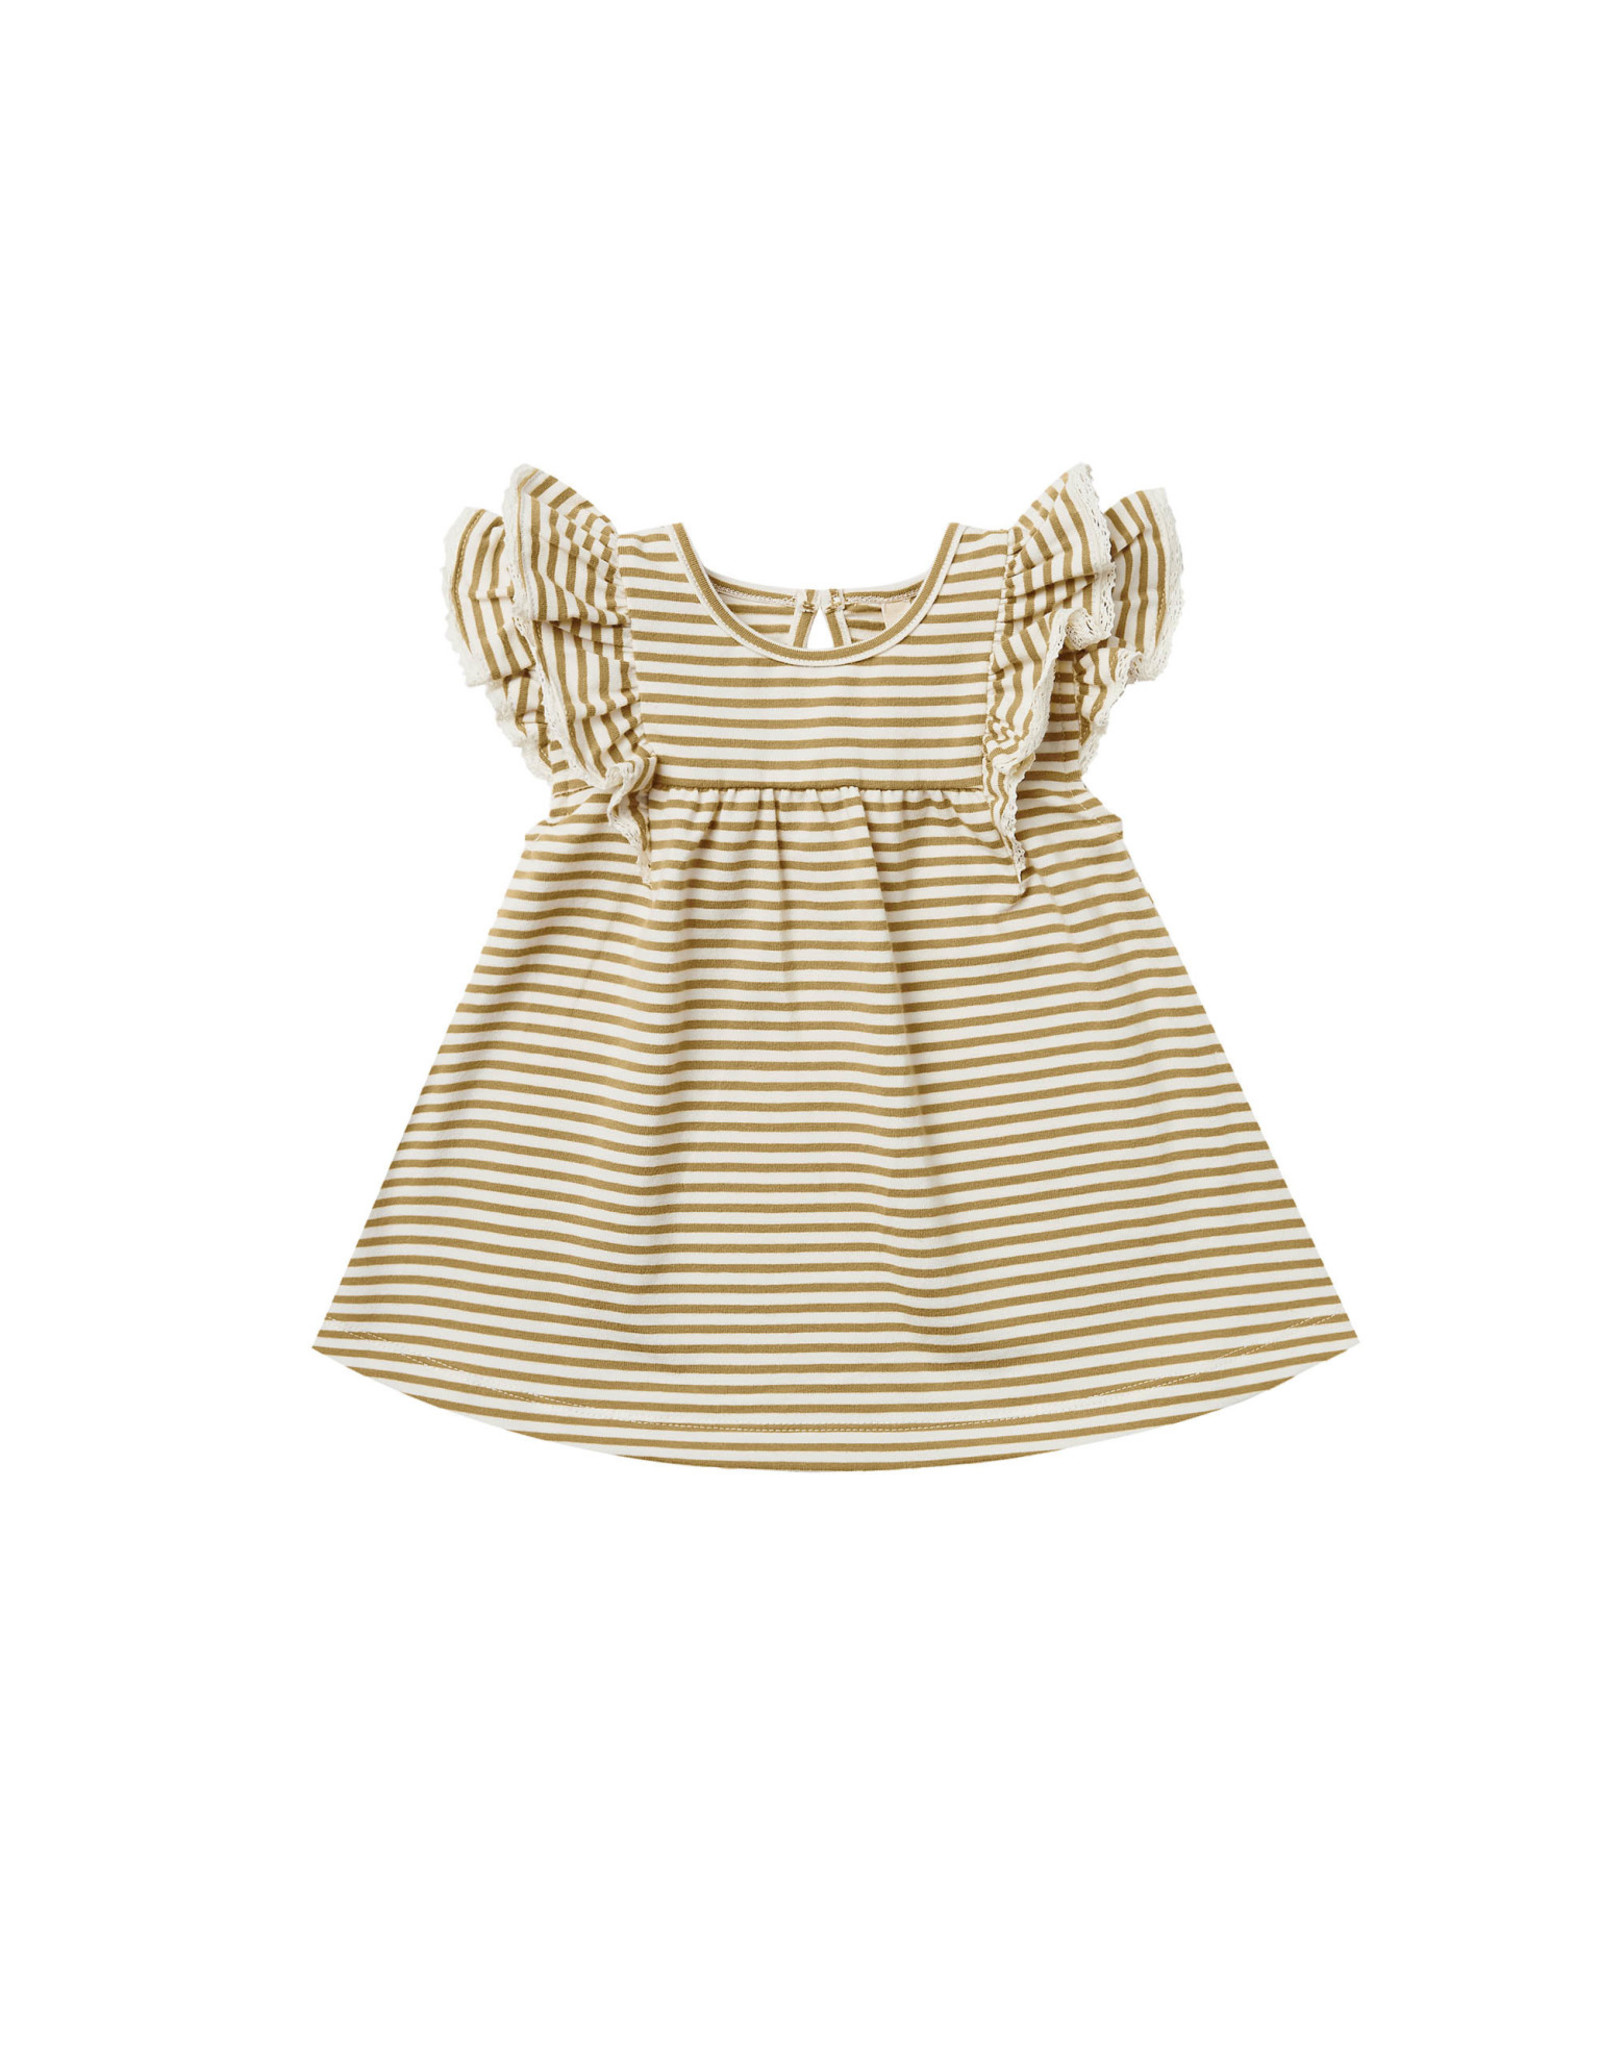 Quincy Mae Quincy Mae Flutter Dress, Gold Stripe